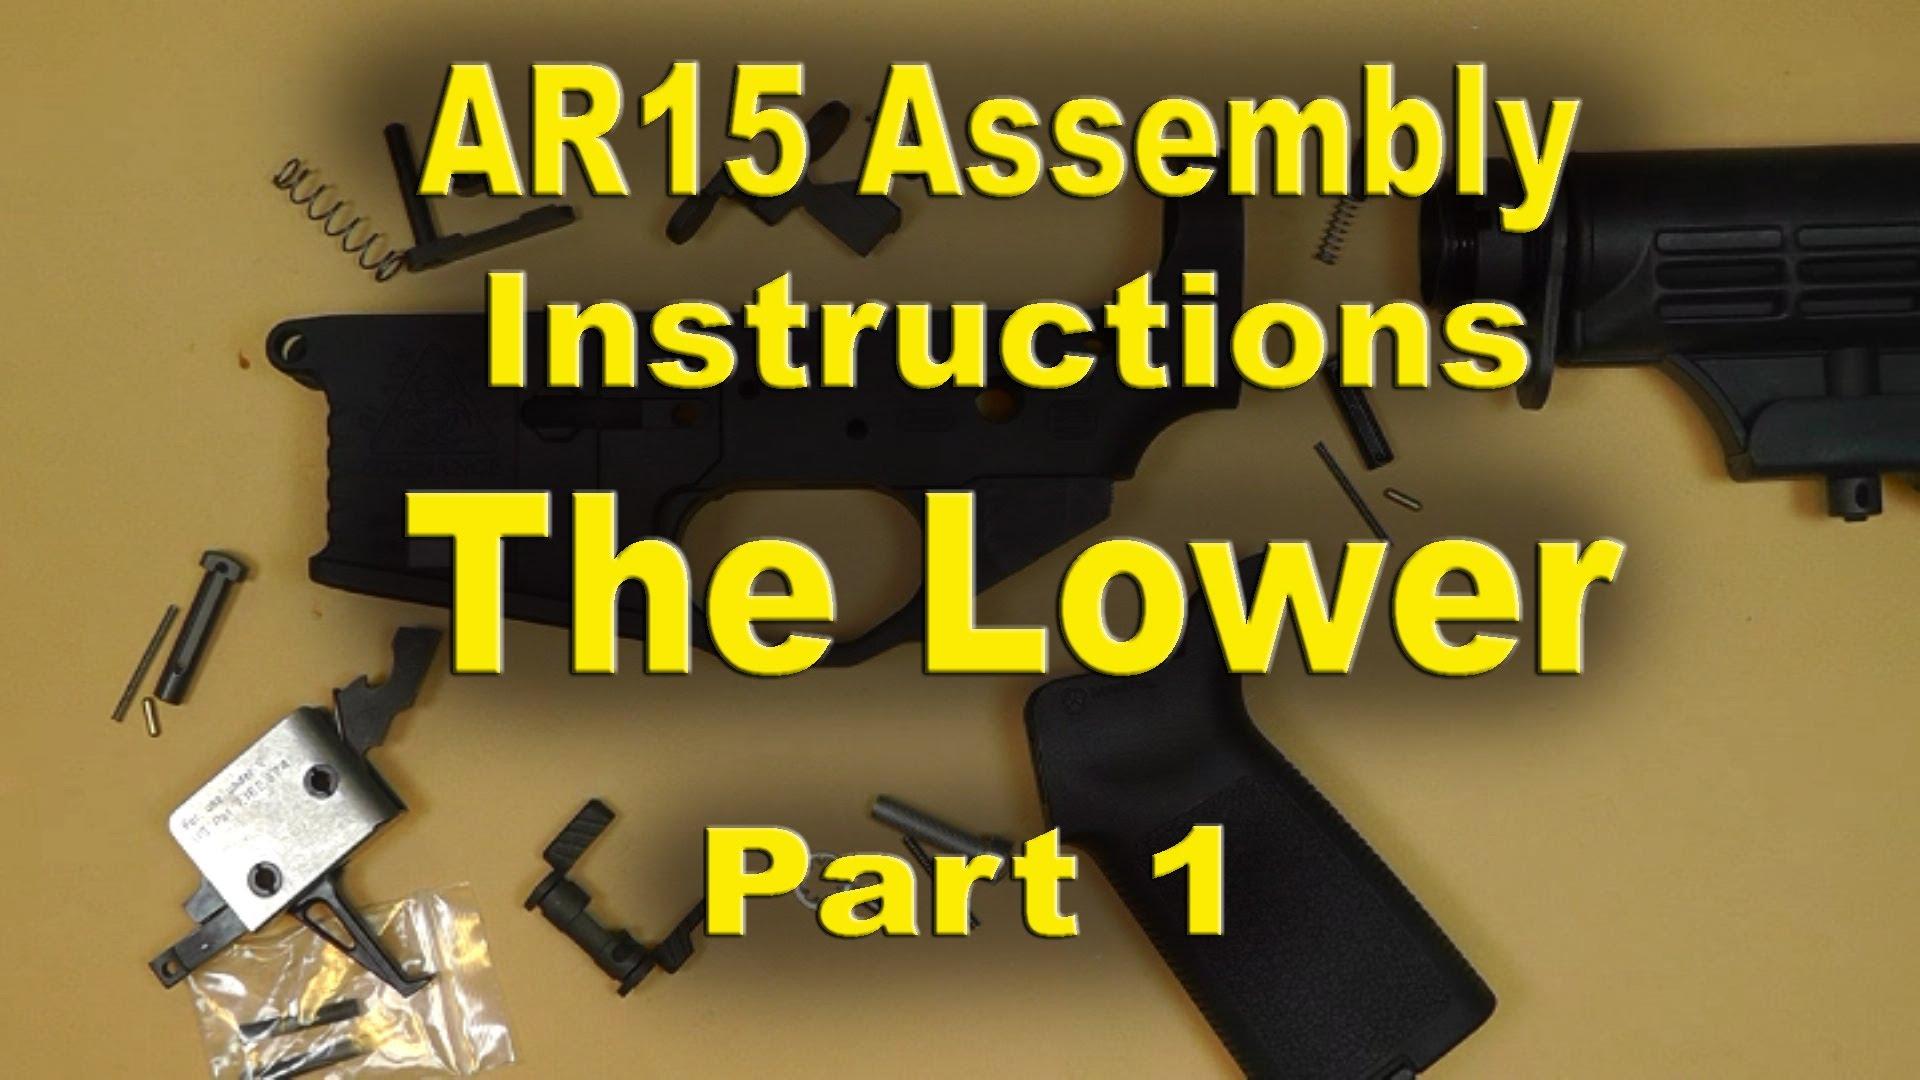 Black Rain Ordnance AR15 Assembly Instructions PART 1 (The Lower)